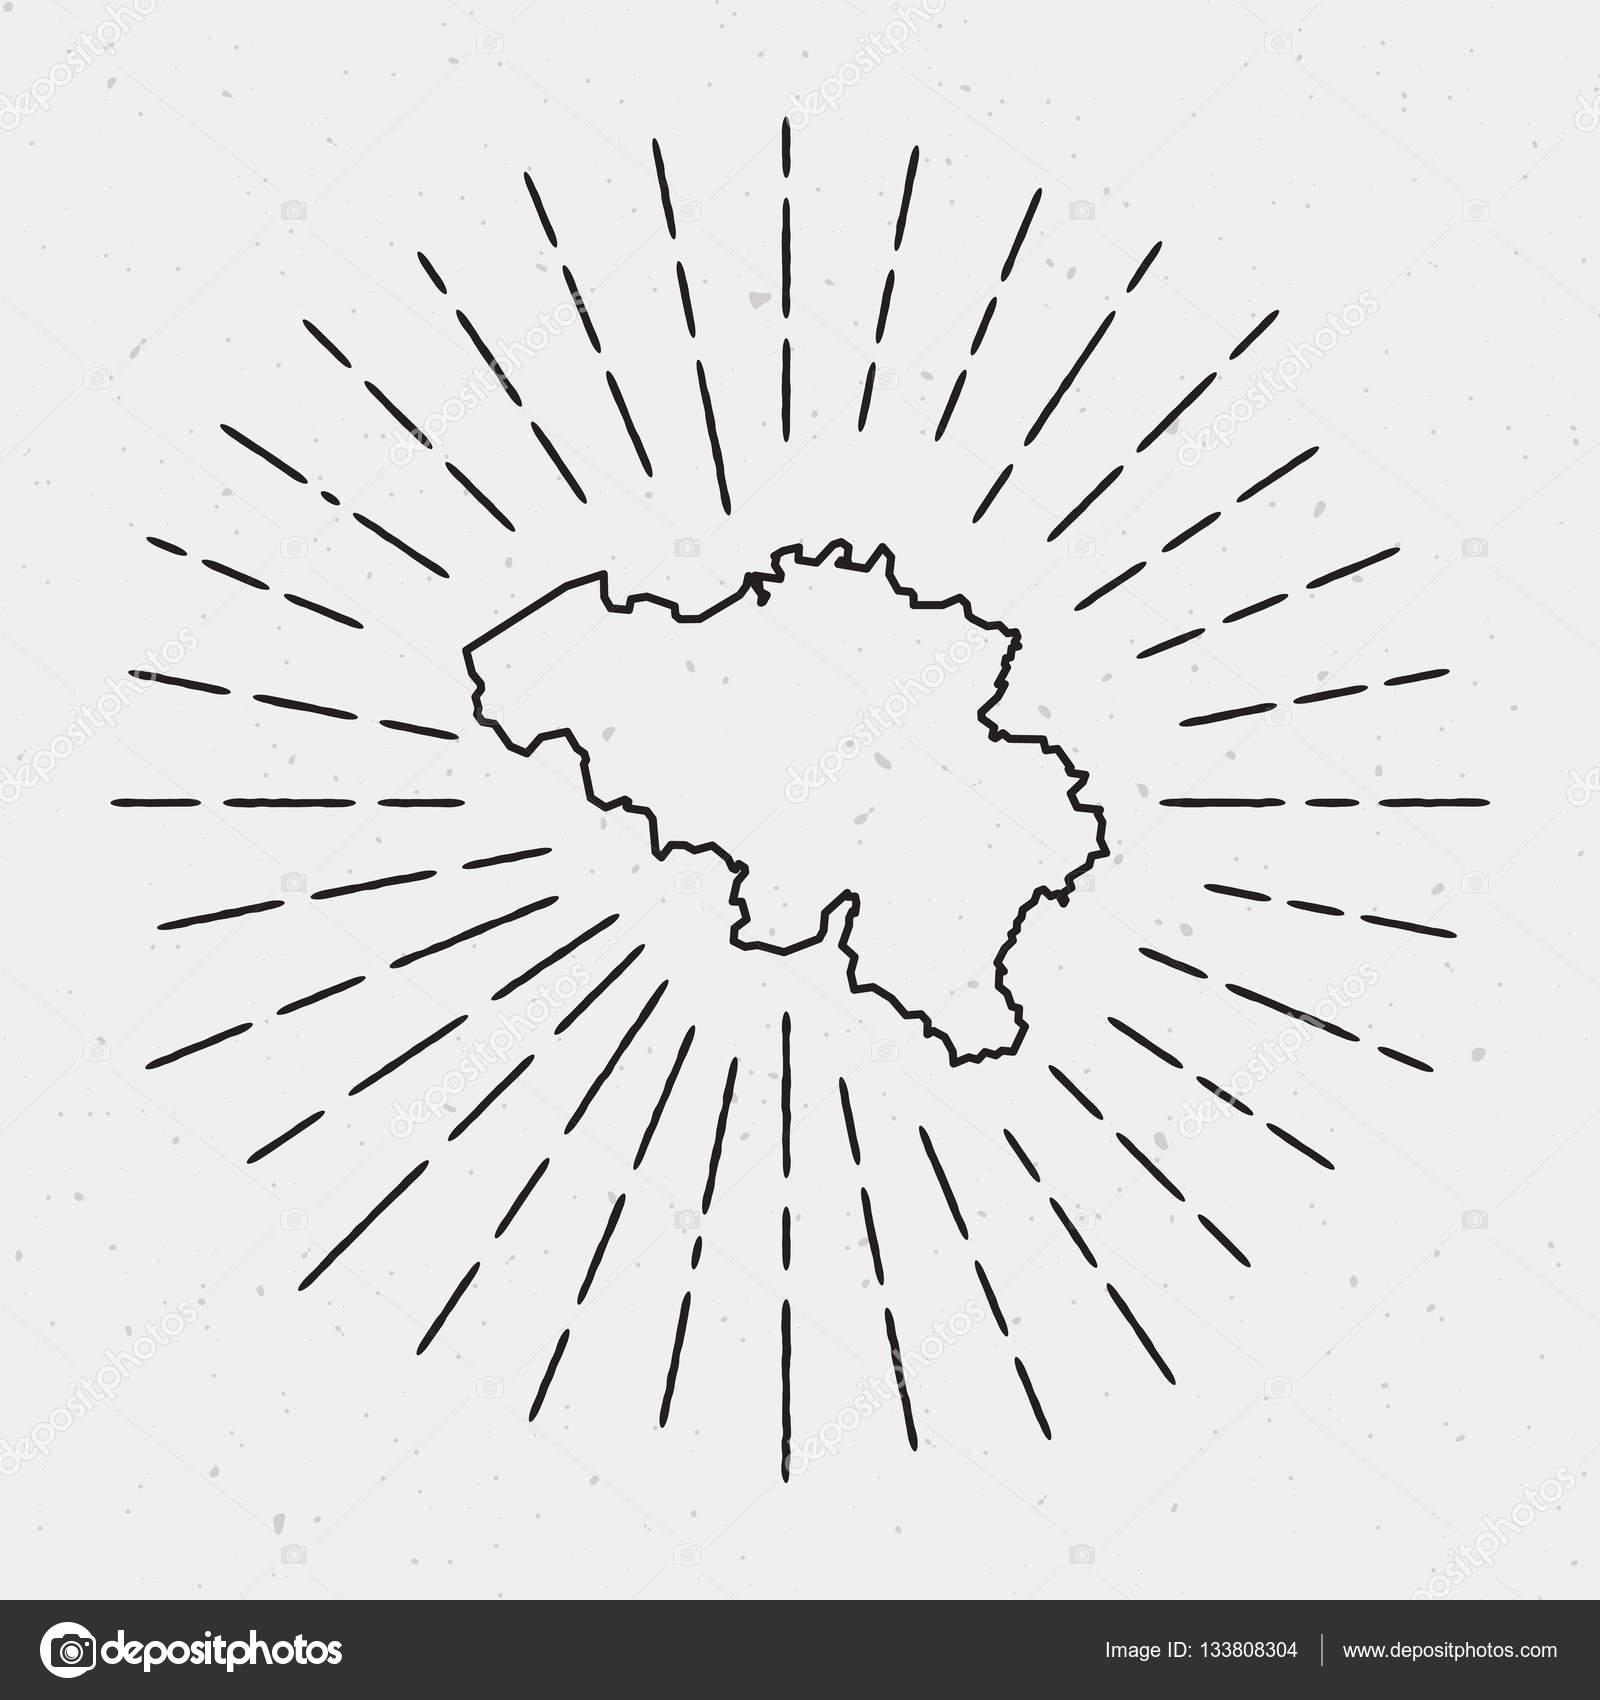 Belgien Karte Umriss.Vektor Belgien Karte Umriss Mit Retro Sunburst Grenze Stockvektor